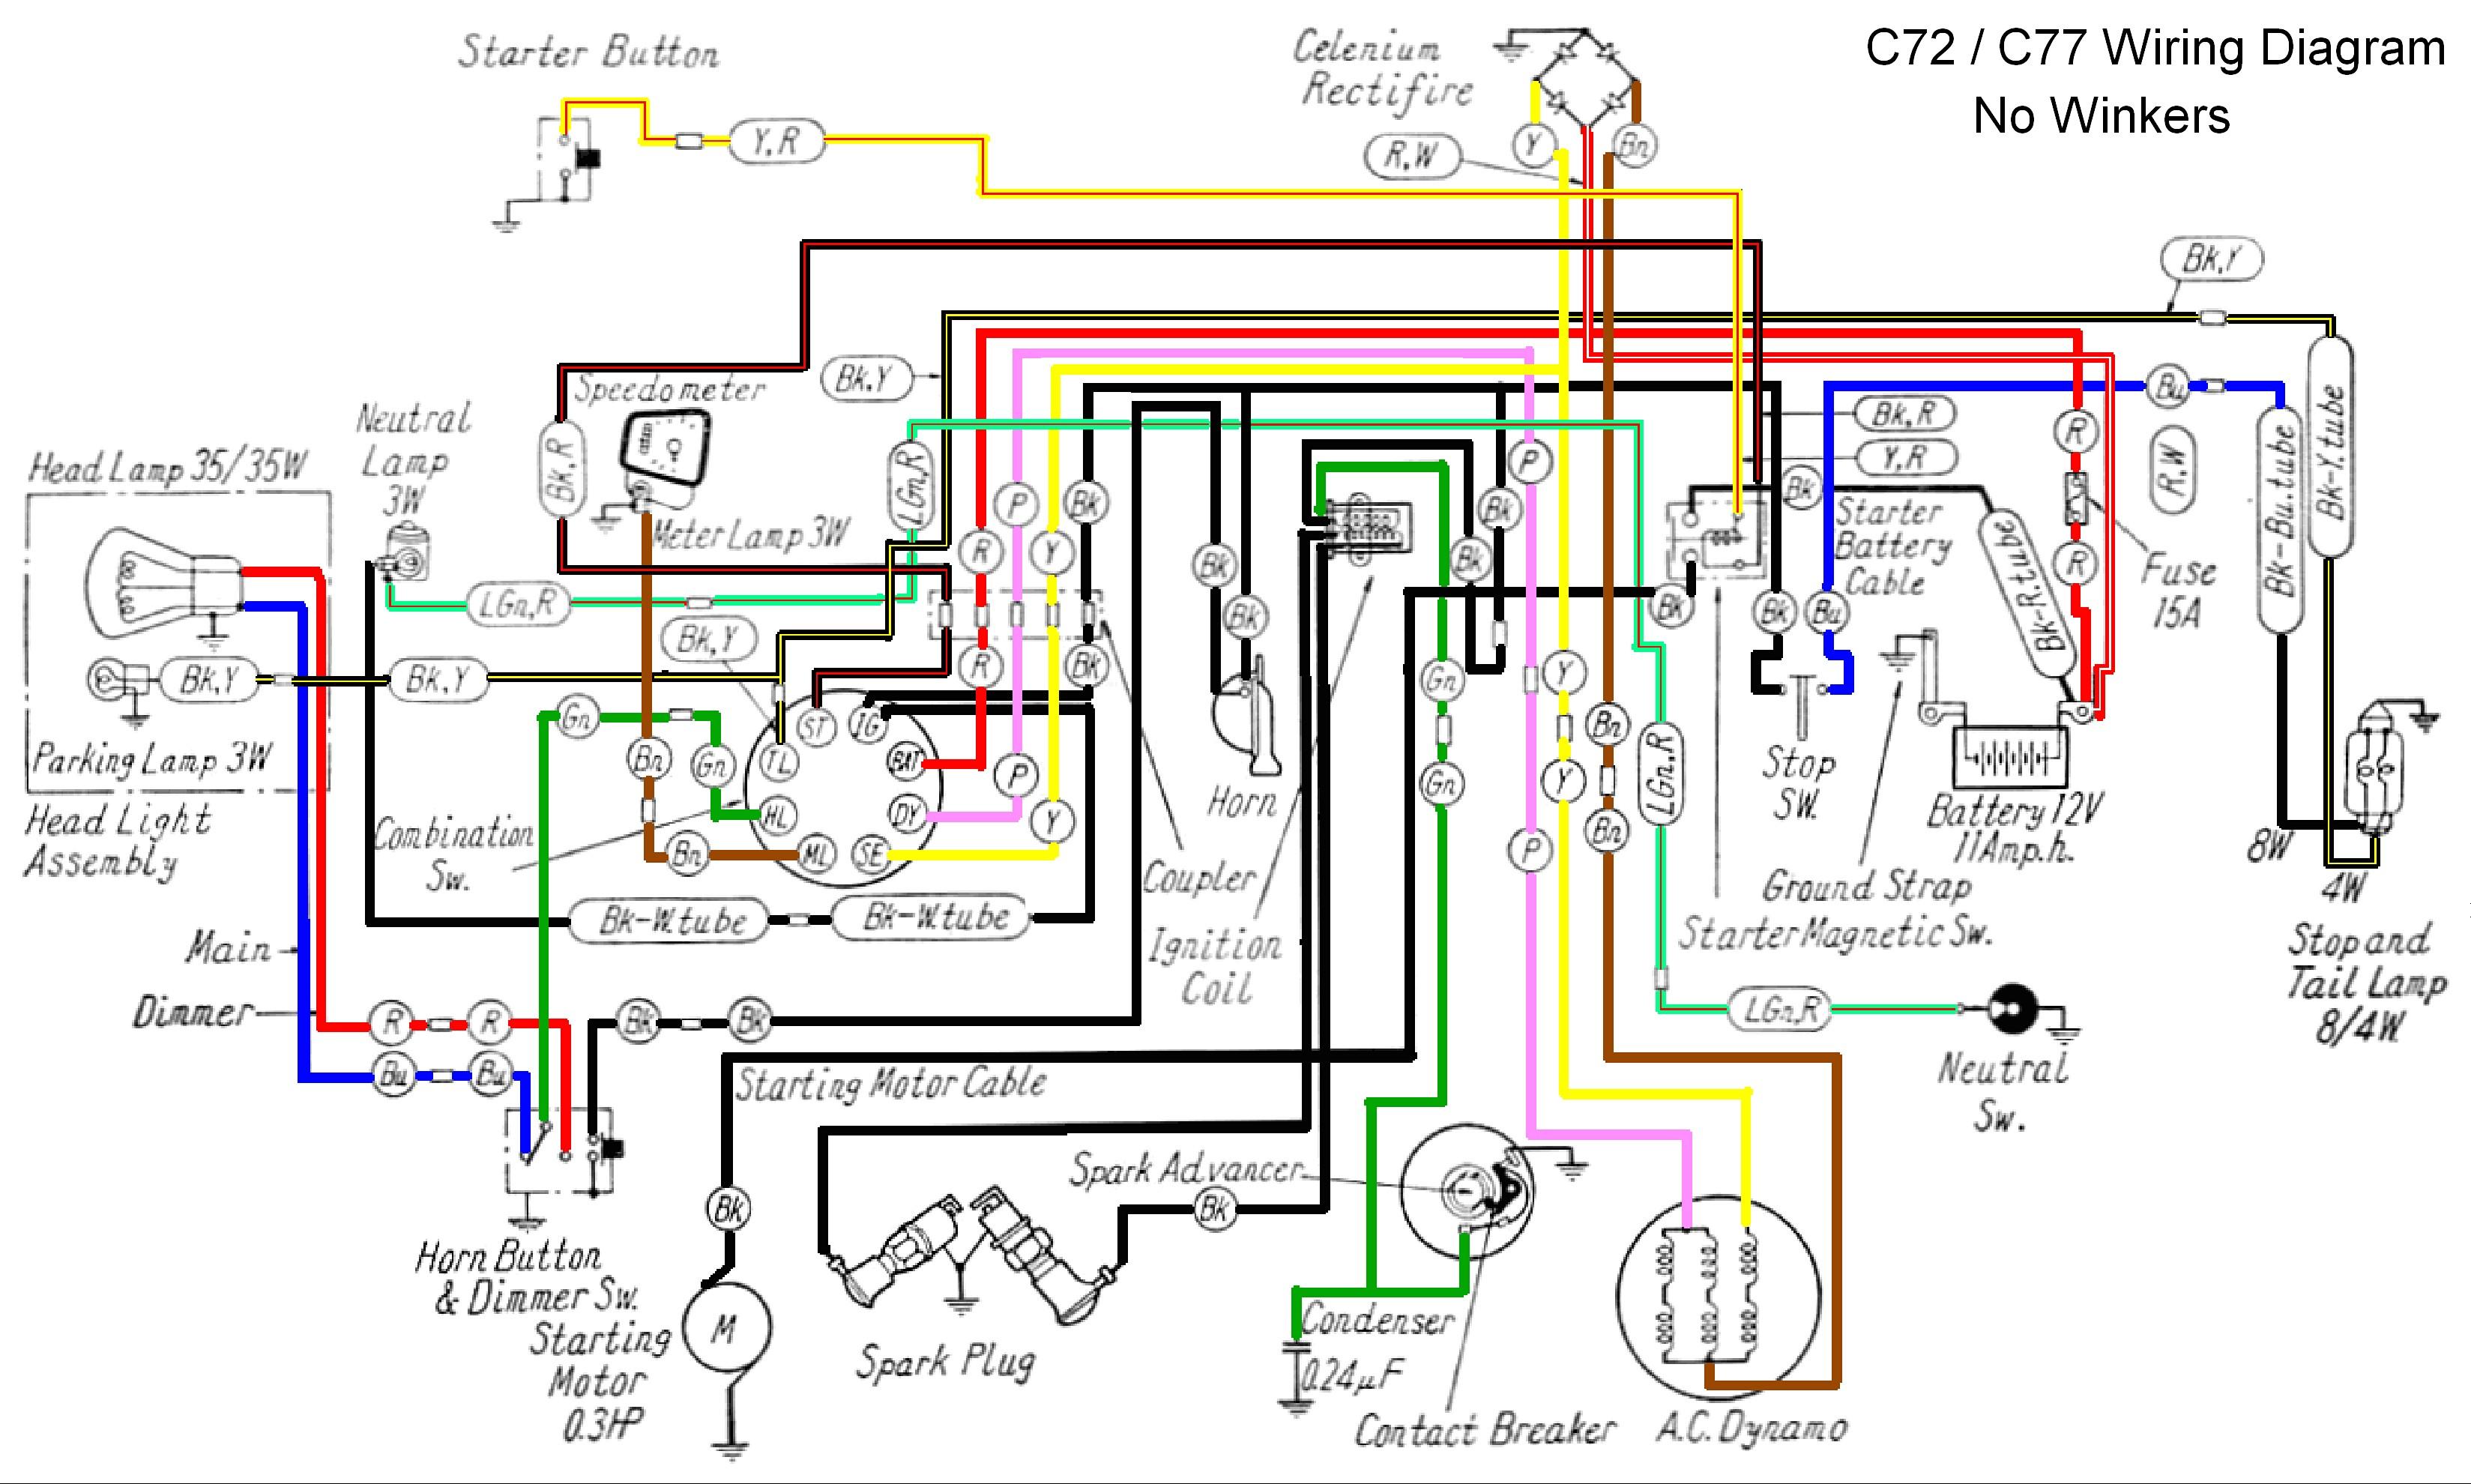 Honda Ca175 Wiring Diagram Wire Data Schema Ca77 Explained Diagrams Rh Dmdelectro Co Basic Motorcycle Z50